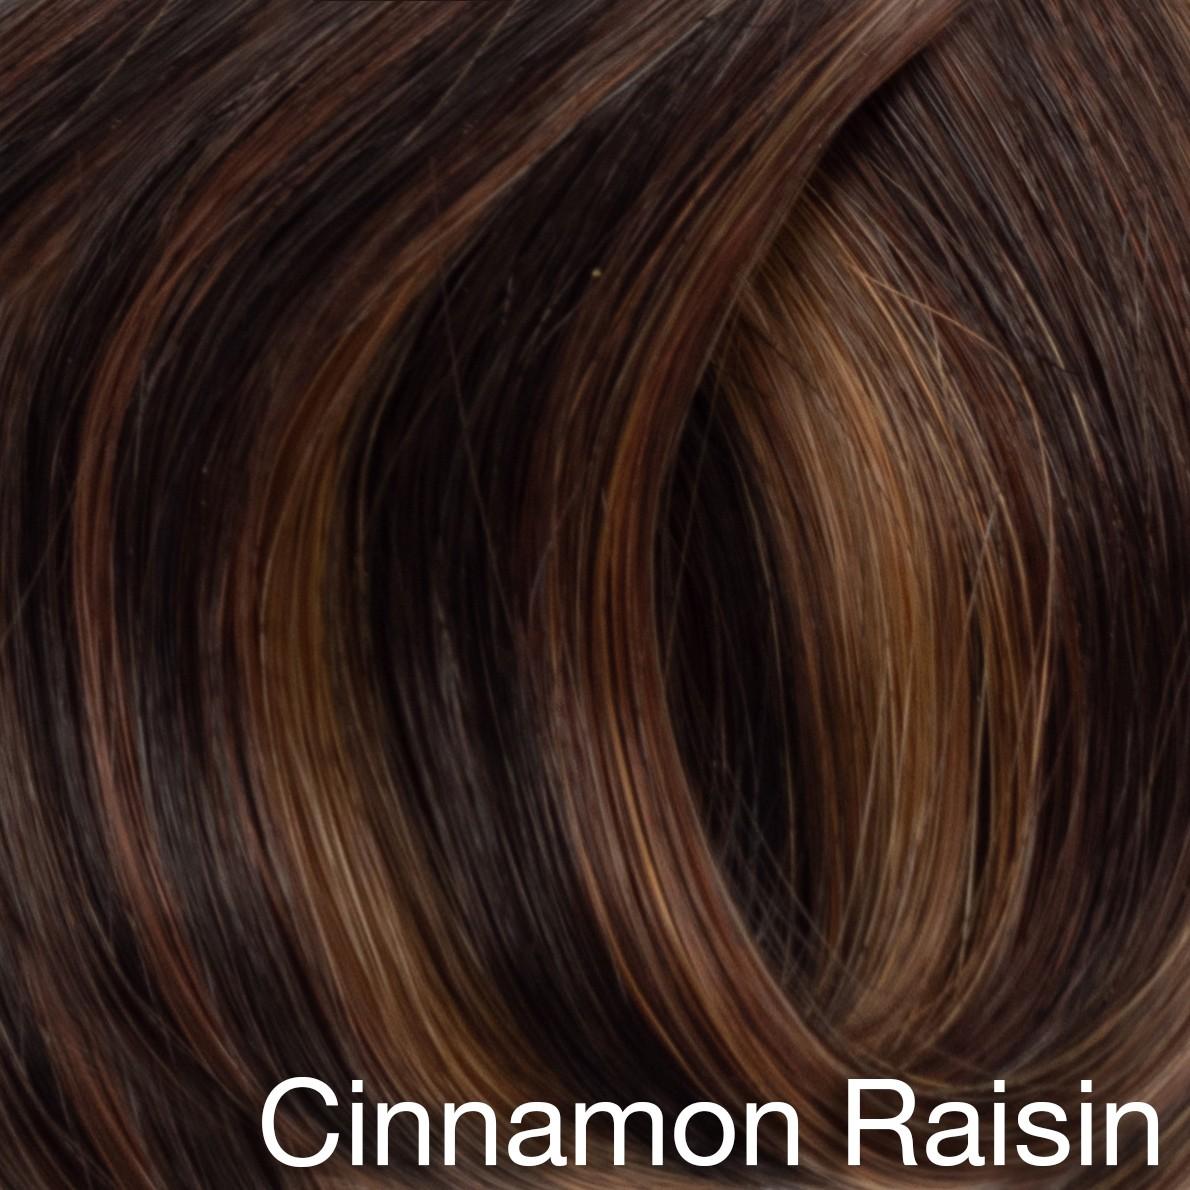 Cinnamon Raissin